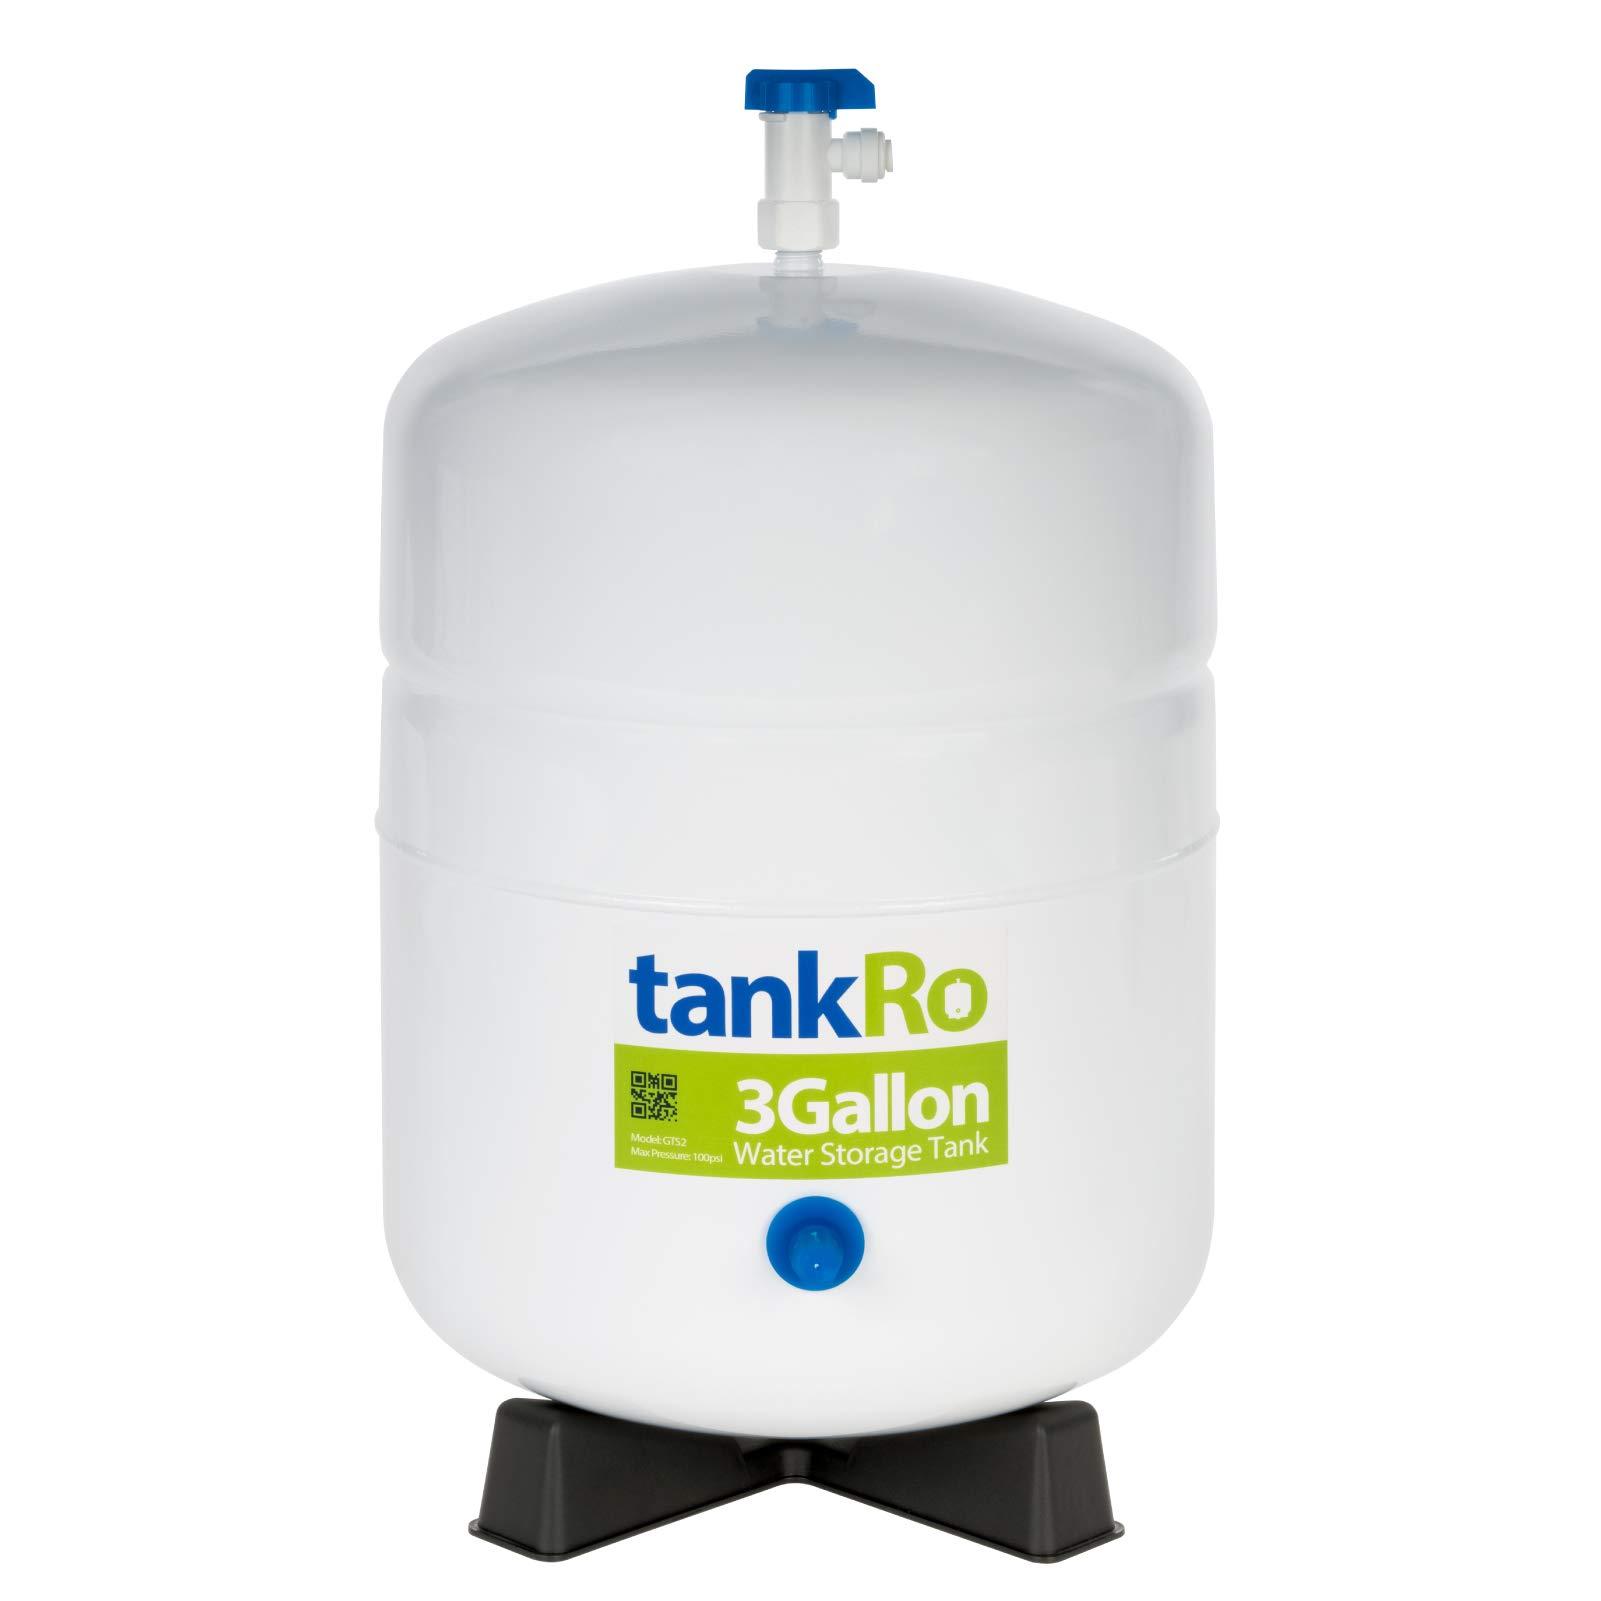 tankRo 3 Gallon RO Expansion Tank - Compact Reverse Osmosis Water Storage Pressure Tank with Free Tank Ball Valve by tankRo